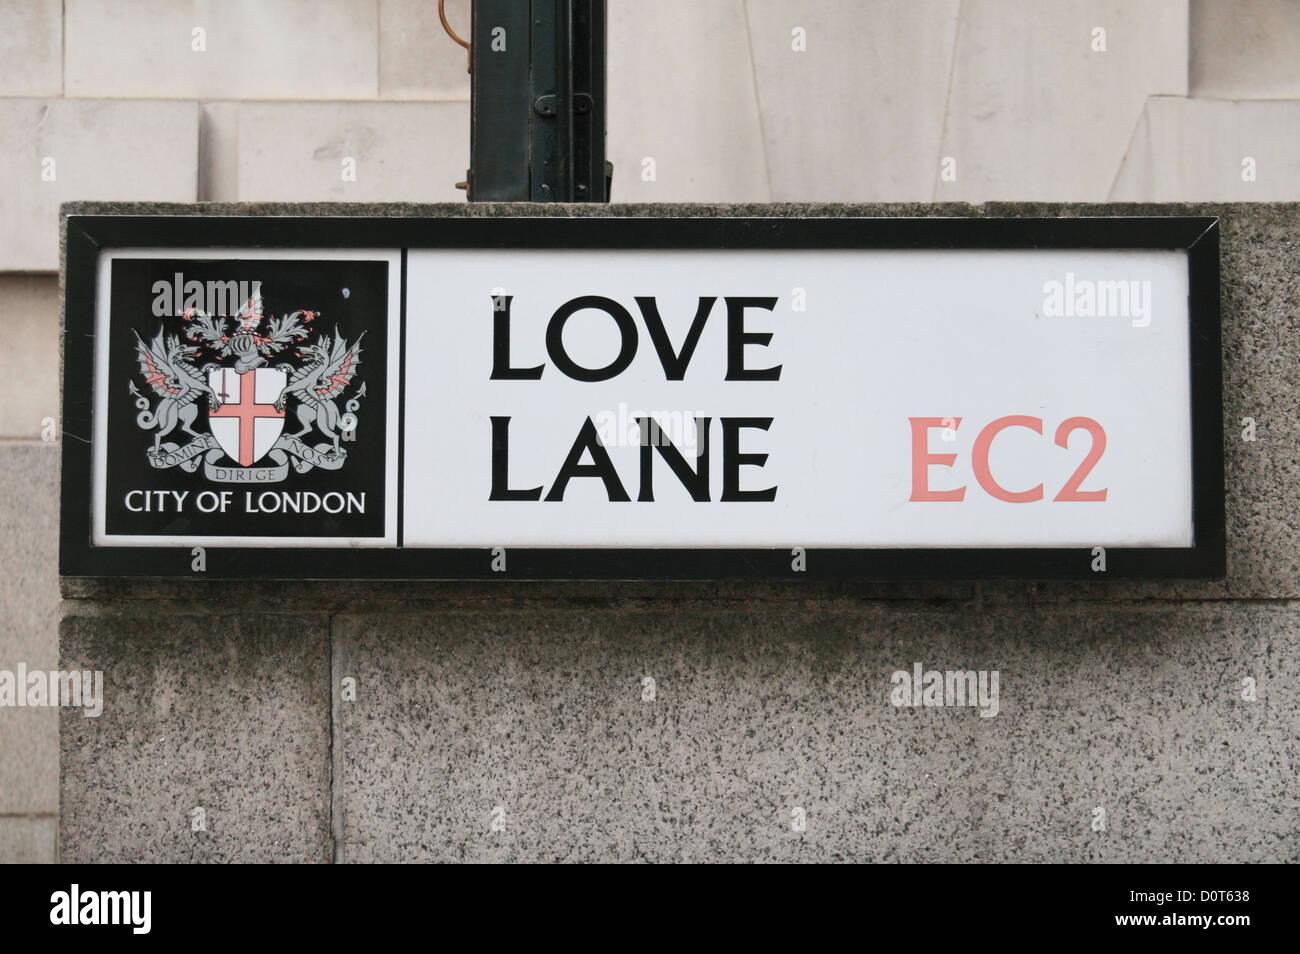 Road sign for Love Lane, City of London, EC2, UK. - Stock Image